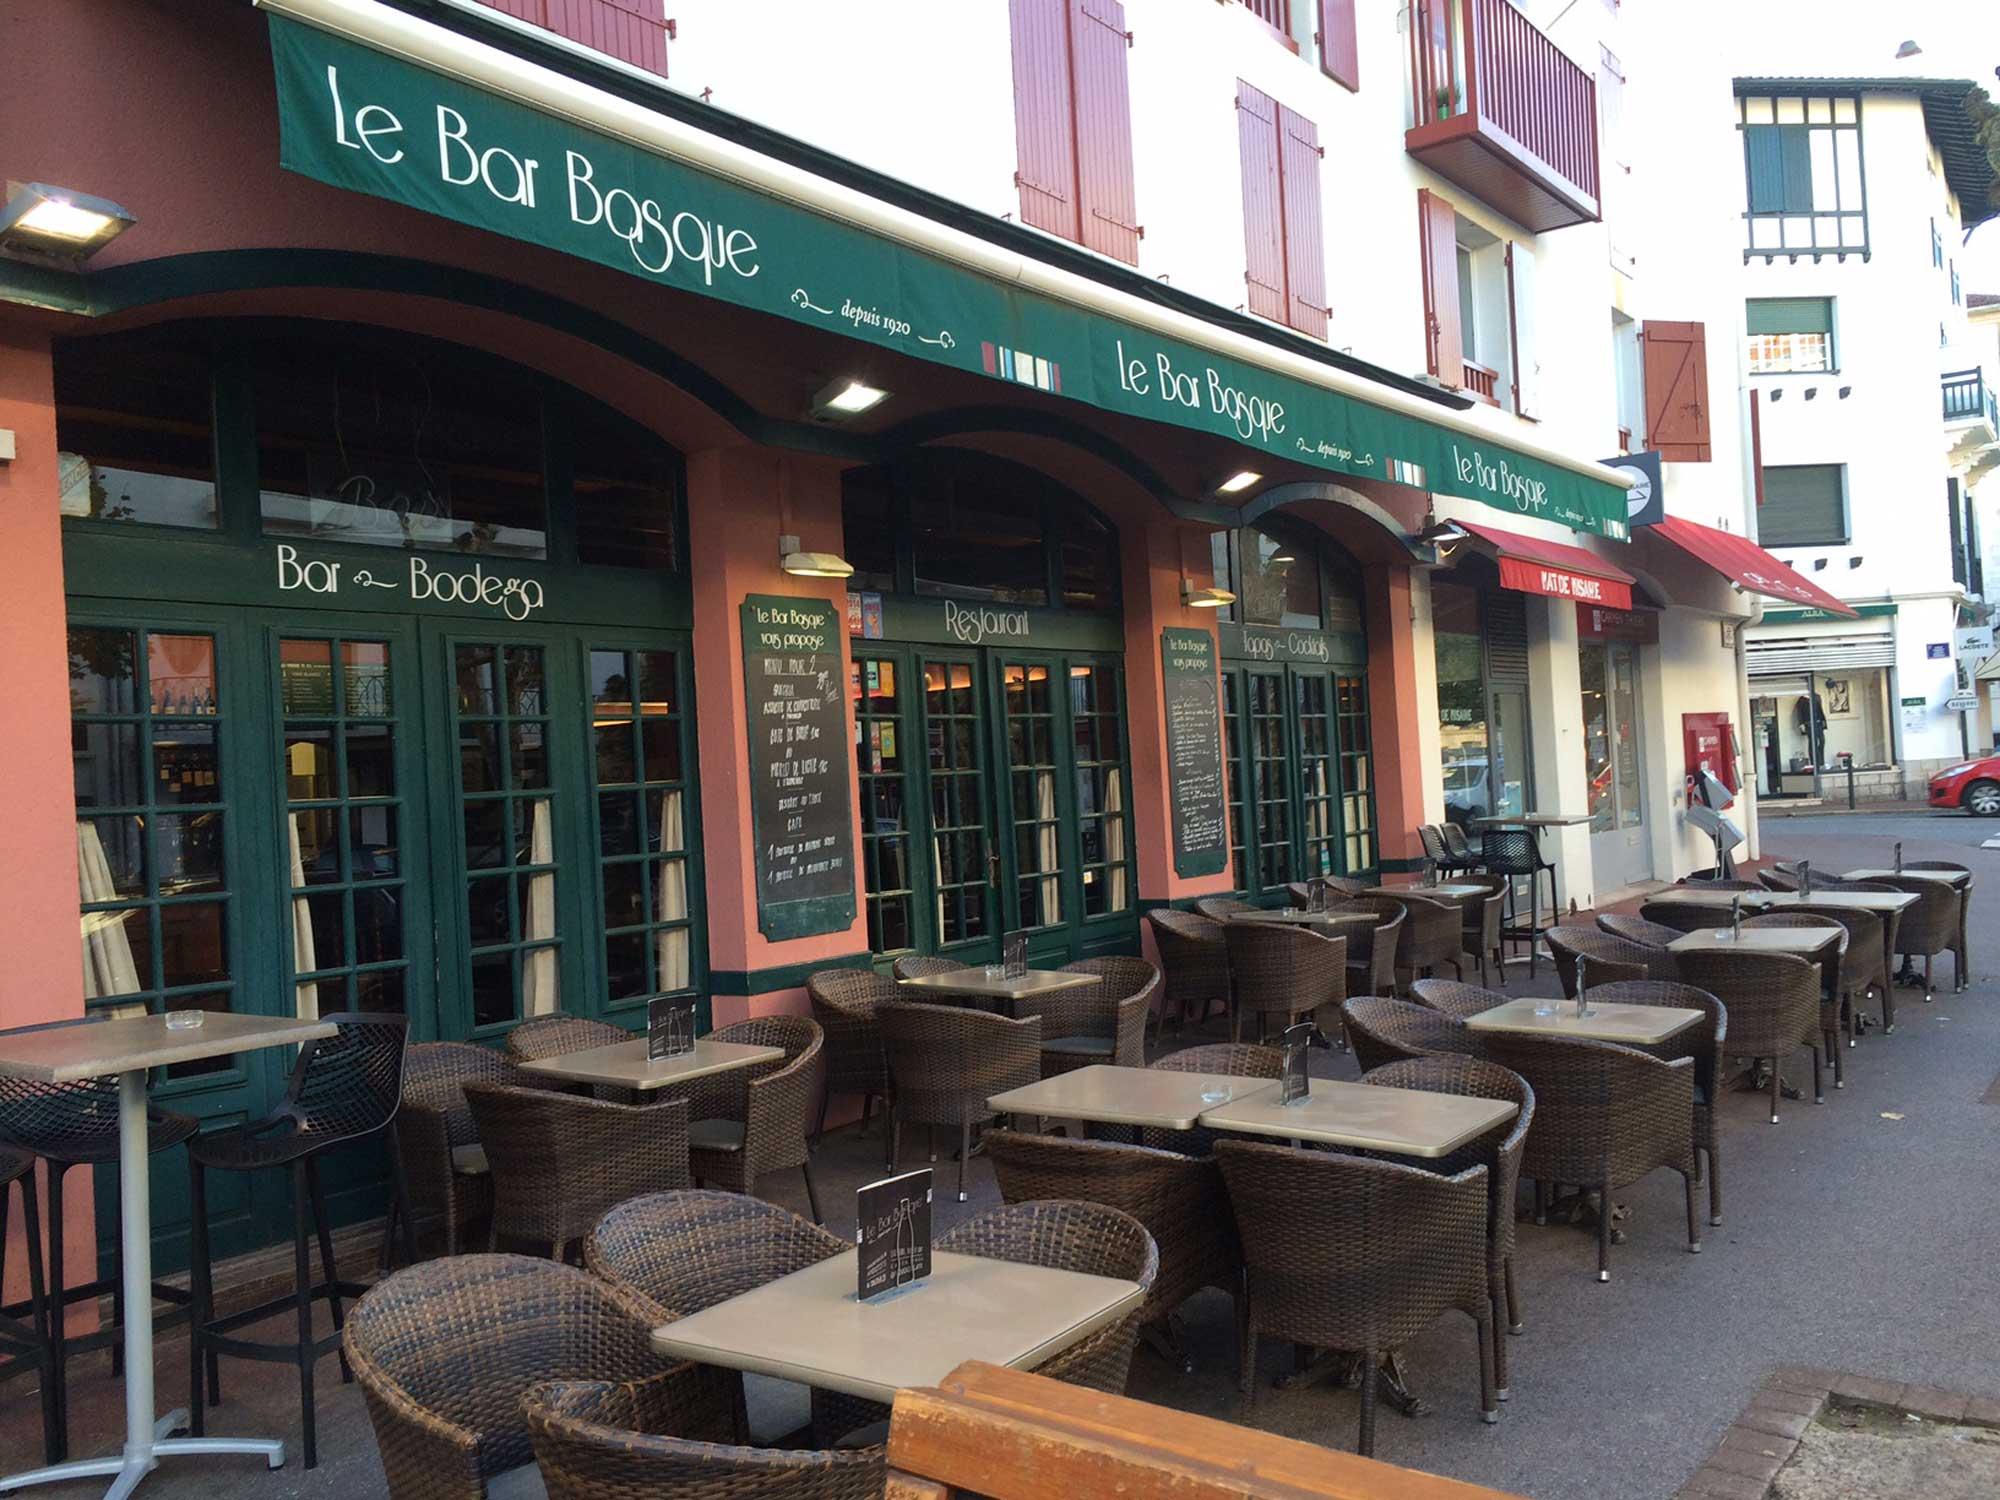 Chr Immo - Le Bar Basque